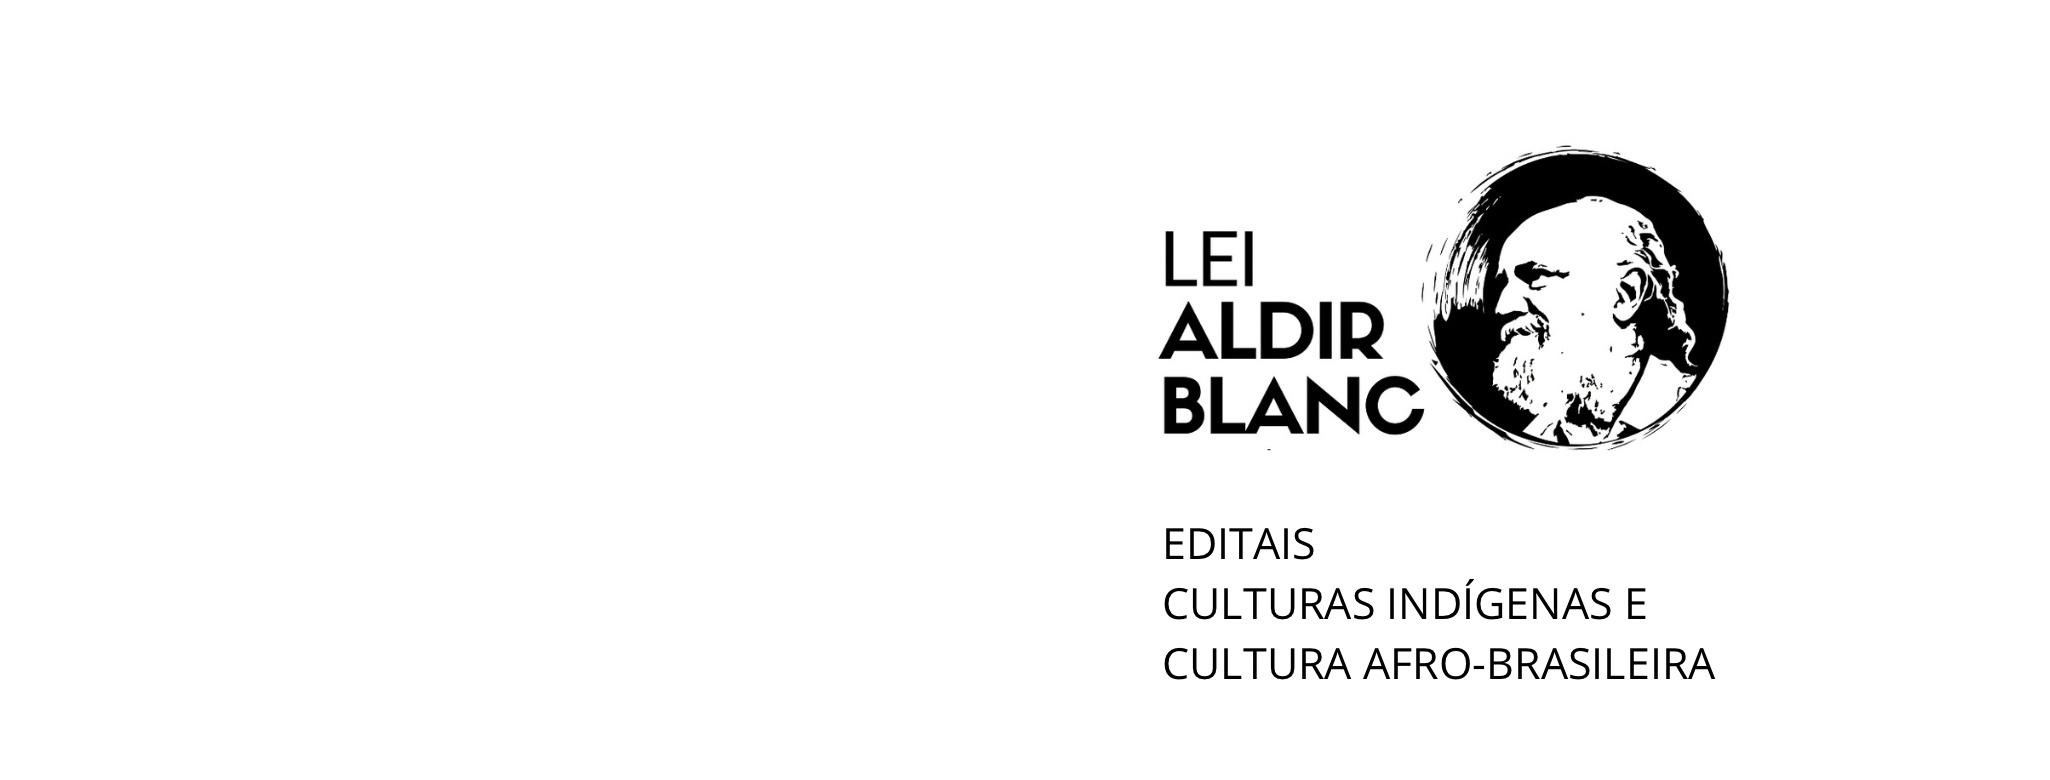 Repasses aos contemplados da Aldir Blanc inicia a partir desta segunda